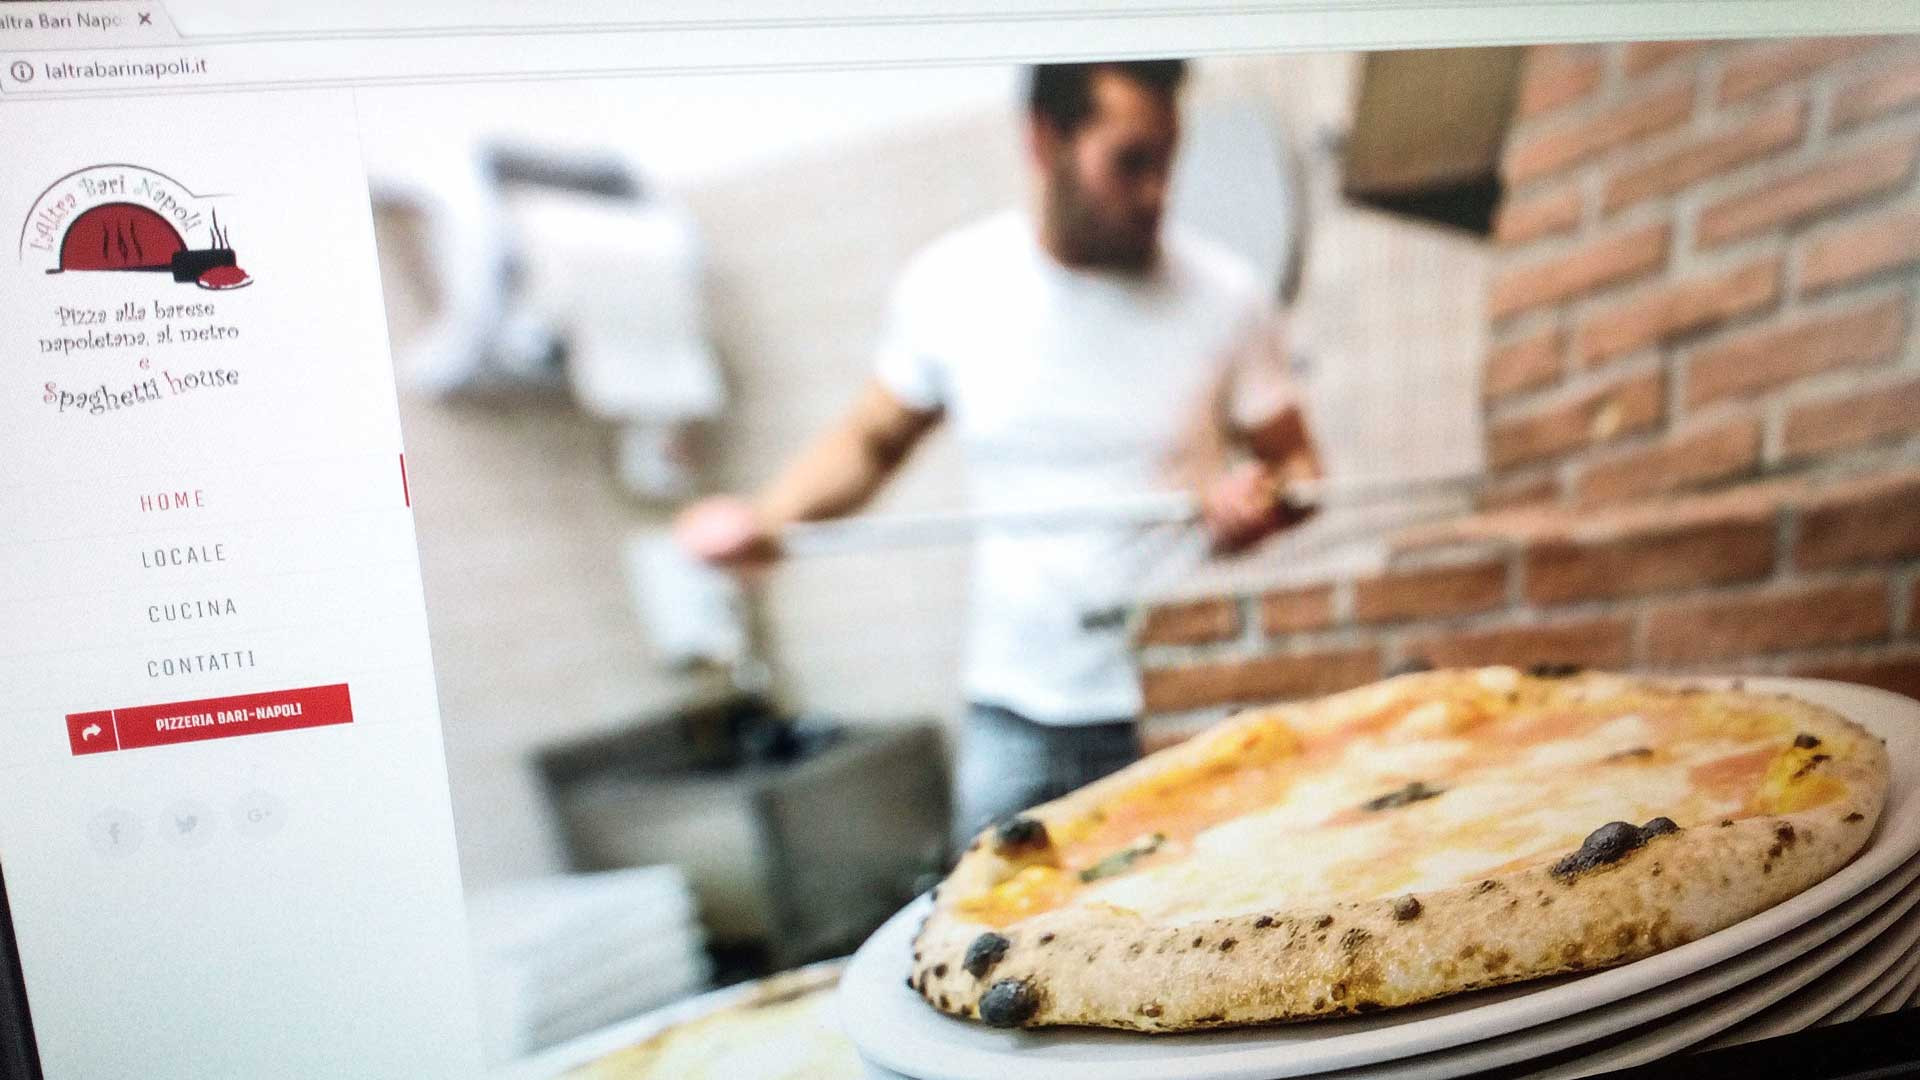 Barinapoli & Laltrabarinapoli - Pizzeria and Restaurant